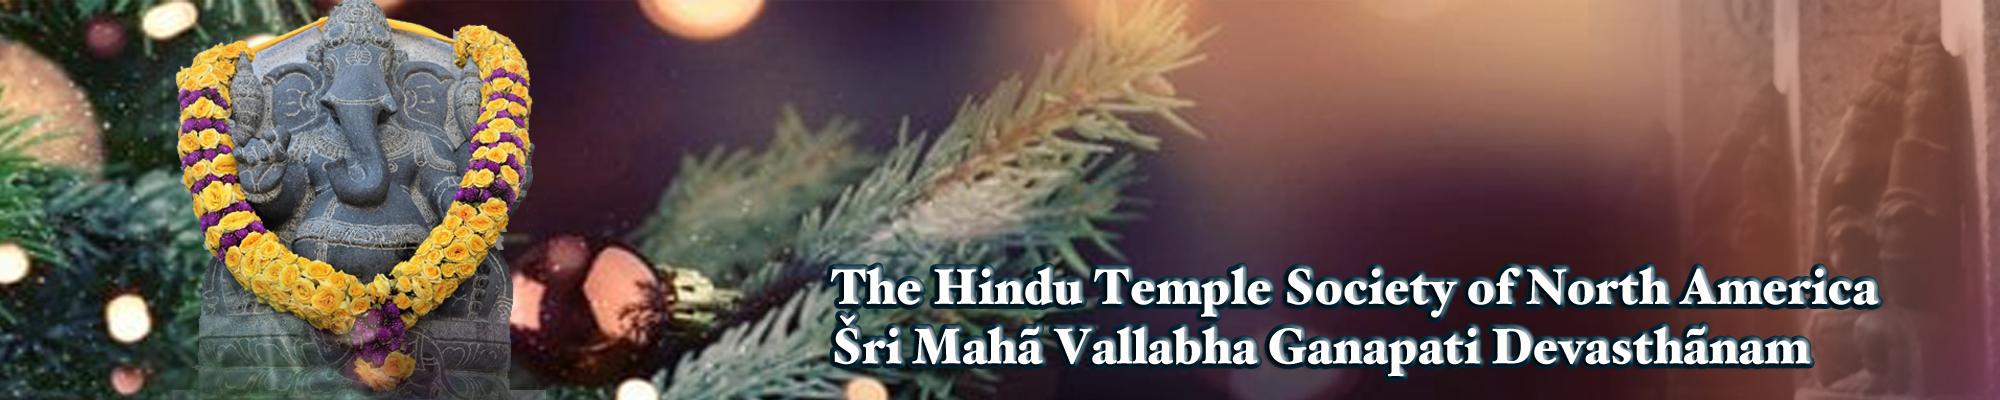 Sri Maha Vallabha Ganapati Devasthanam